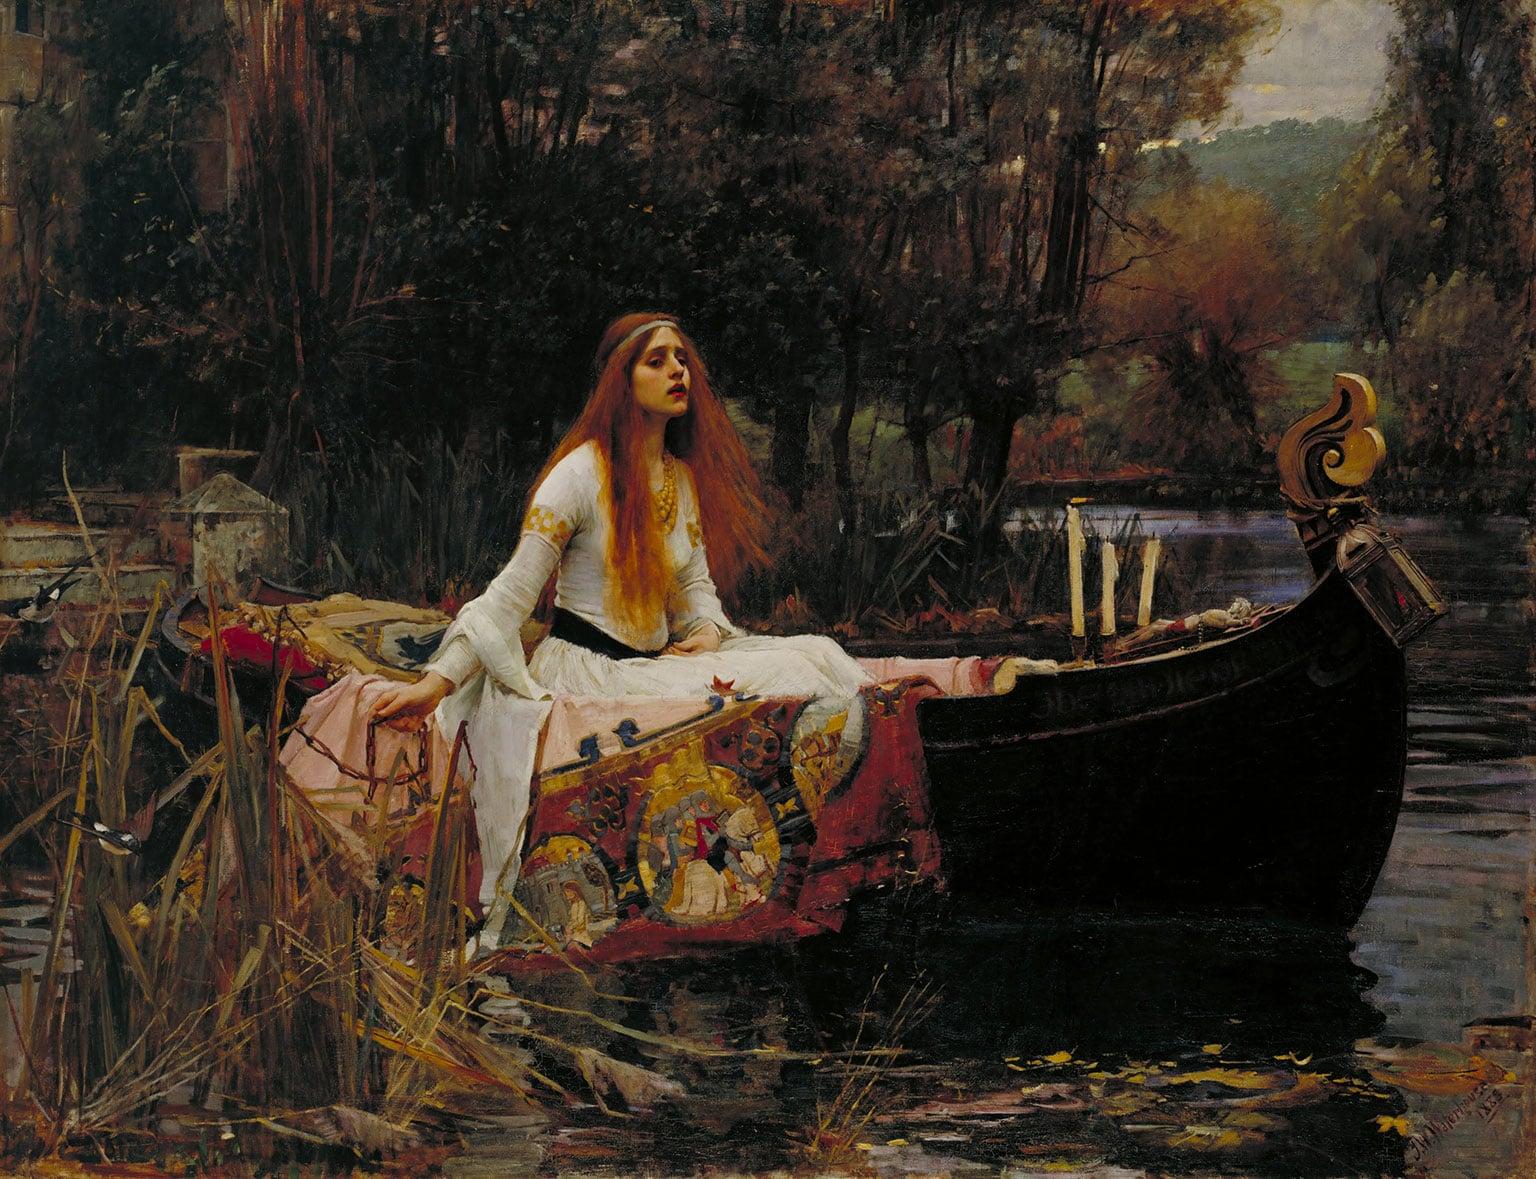 The Lady of Shallot, John William Waterhouse, 1888.